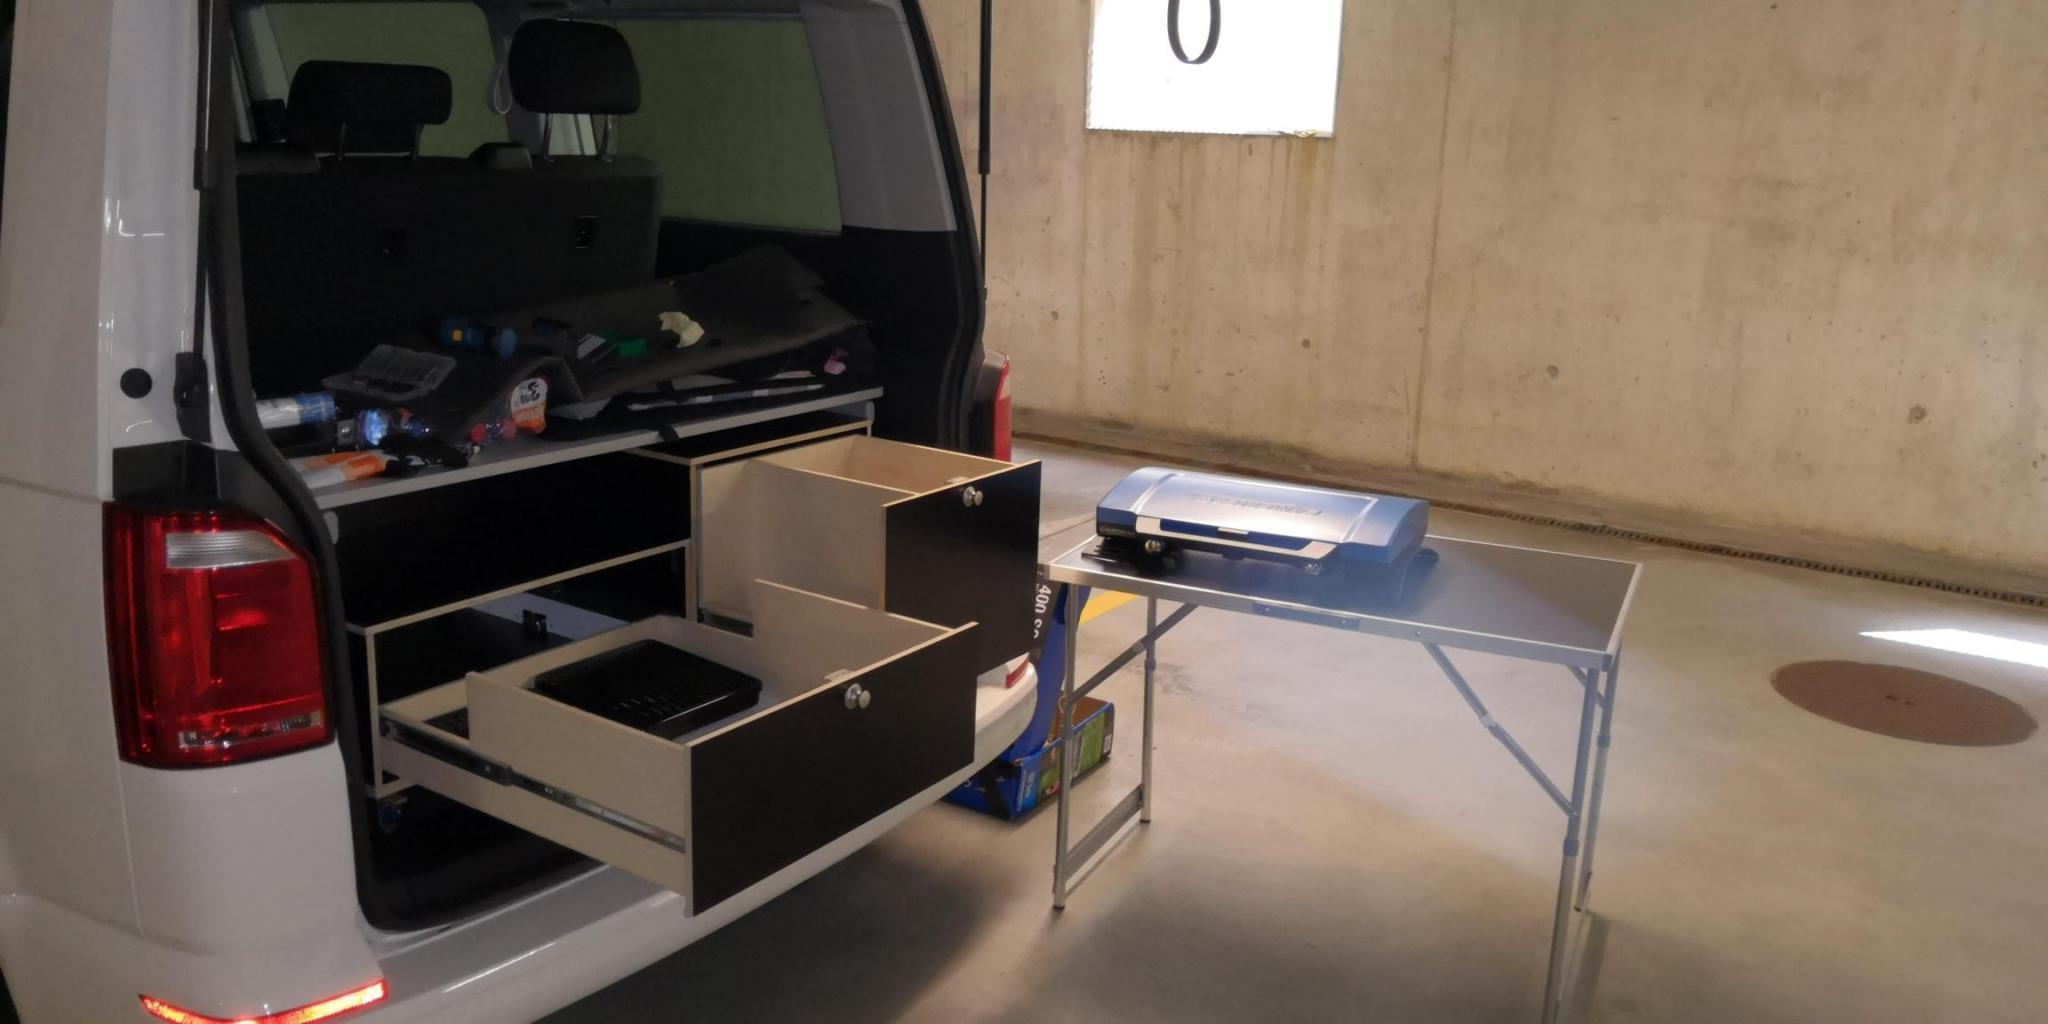 california beach k che selber bauen vw bus kinderbett. Black Bedroom Furniture Sets. Home Design Ideas